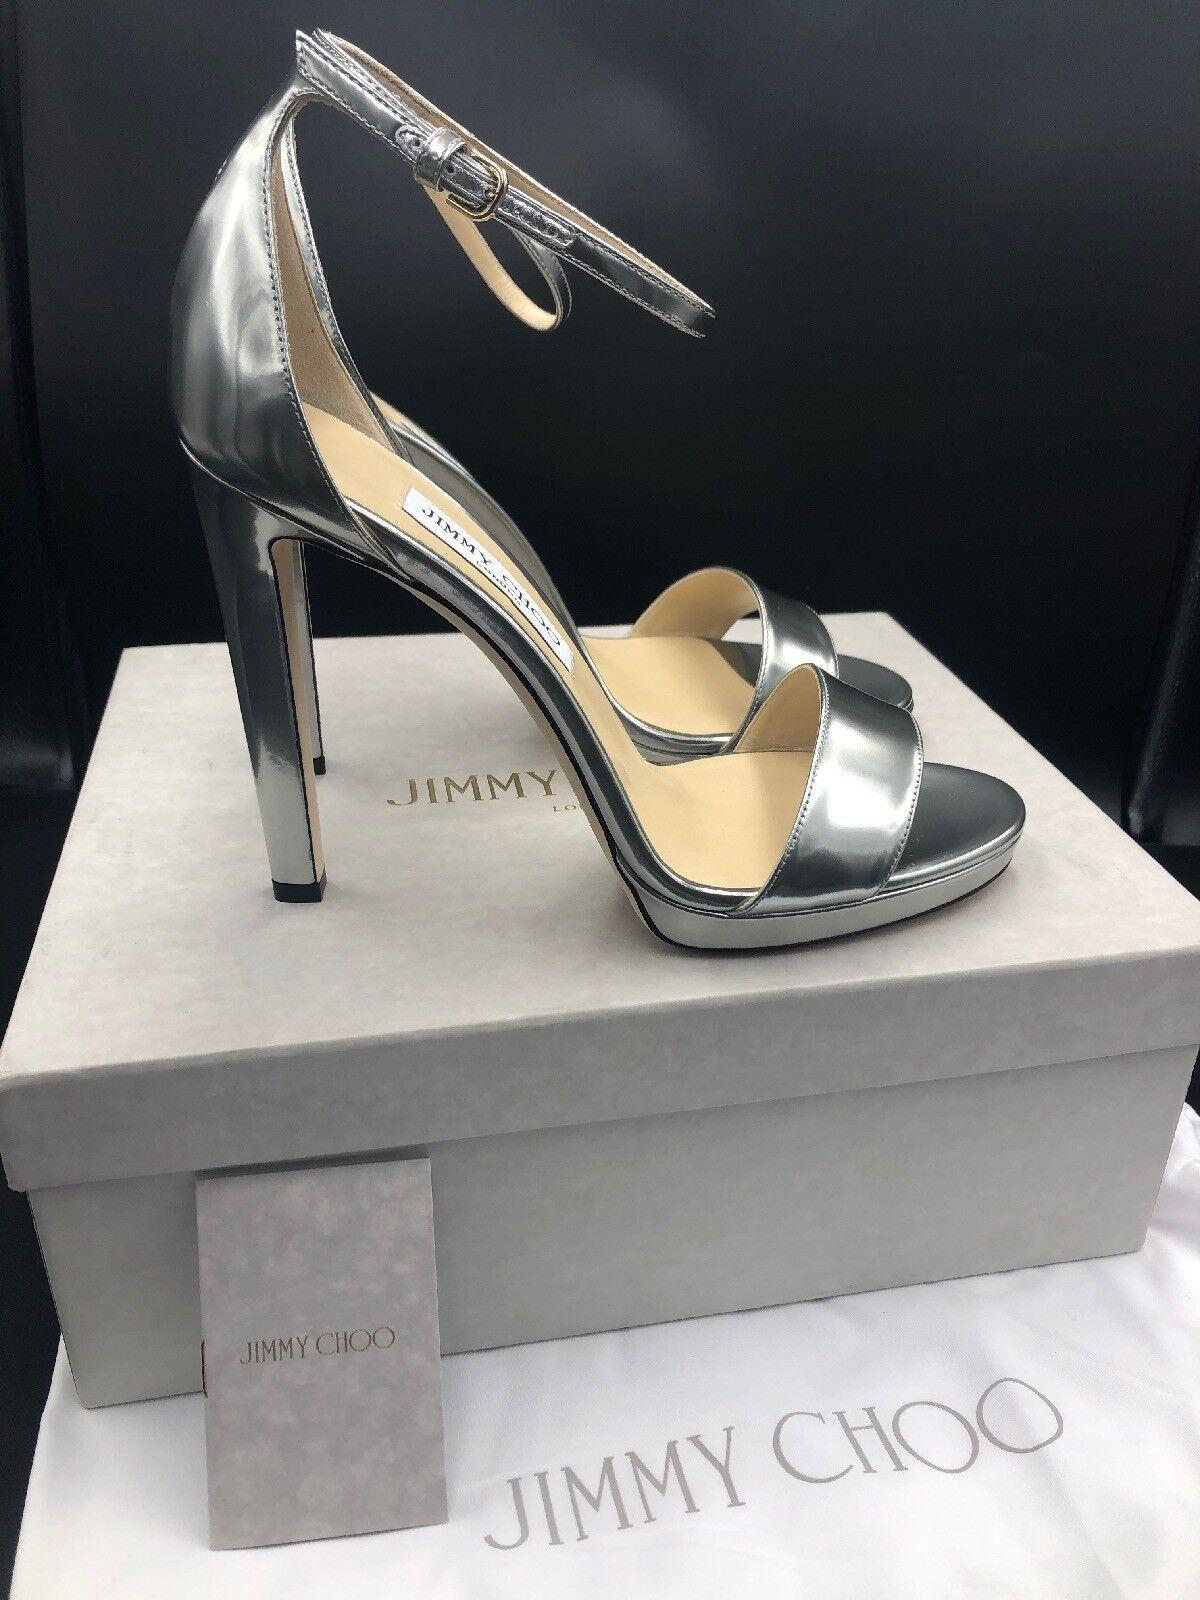 Jimmy Choo 'Misty' 'Misty' 'Misty' Silber Heels Sandals Strappy Größe Uk 7.5 Eu 40.5 Rrp e66ffe